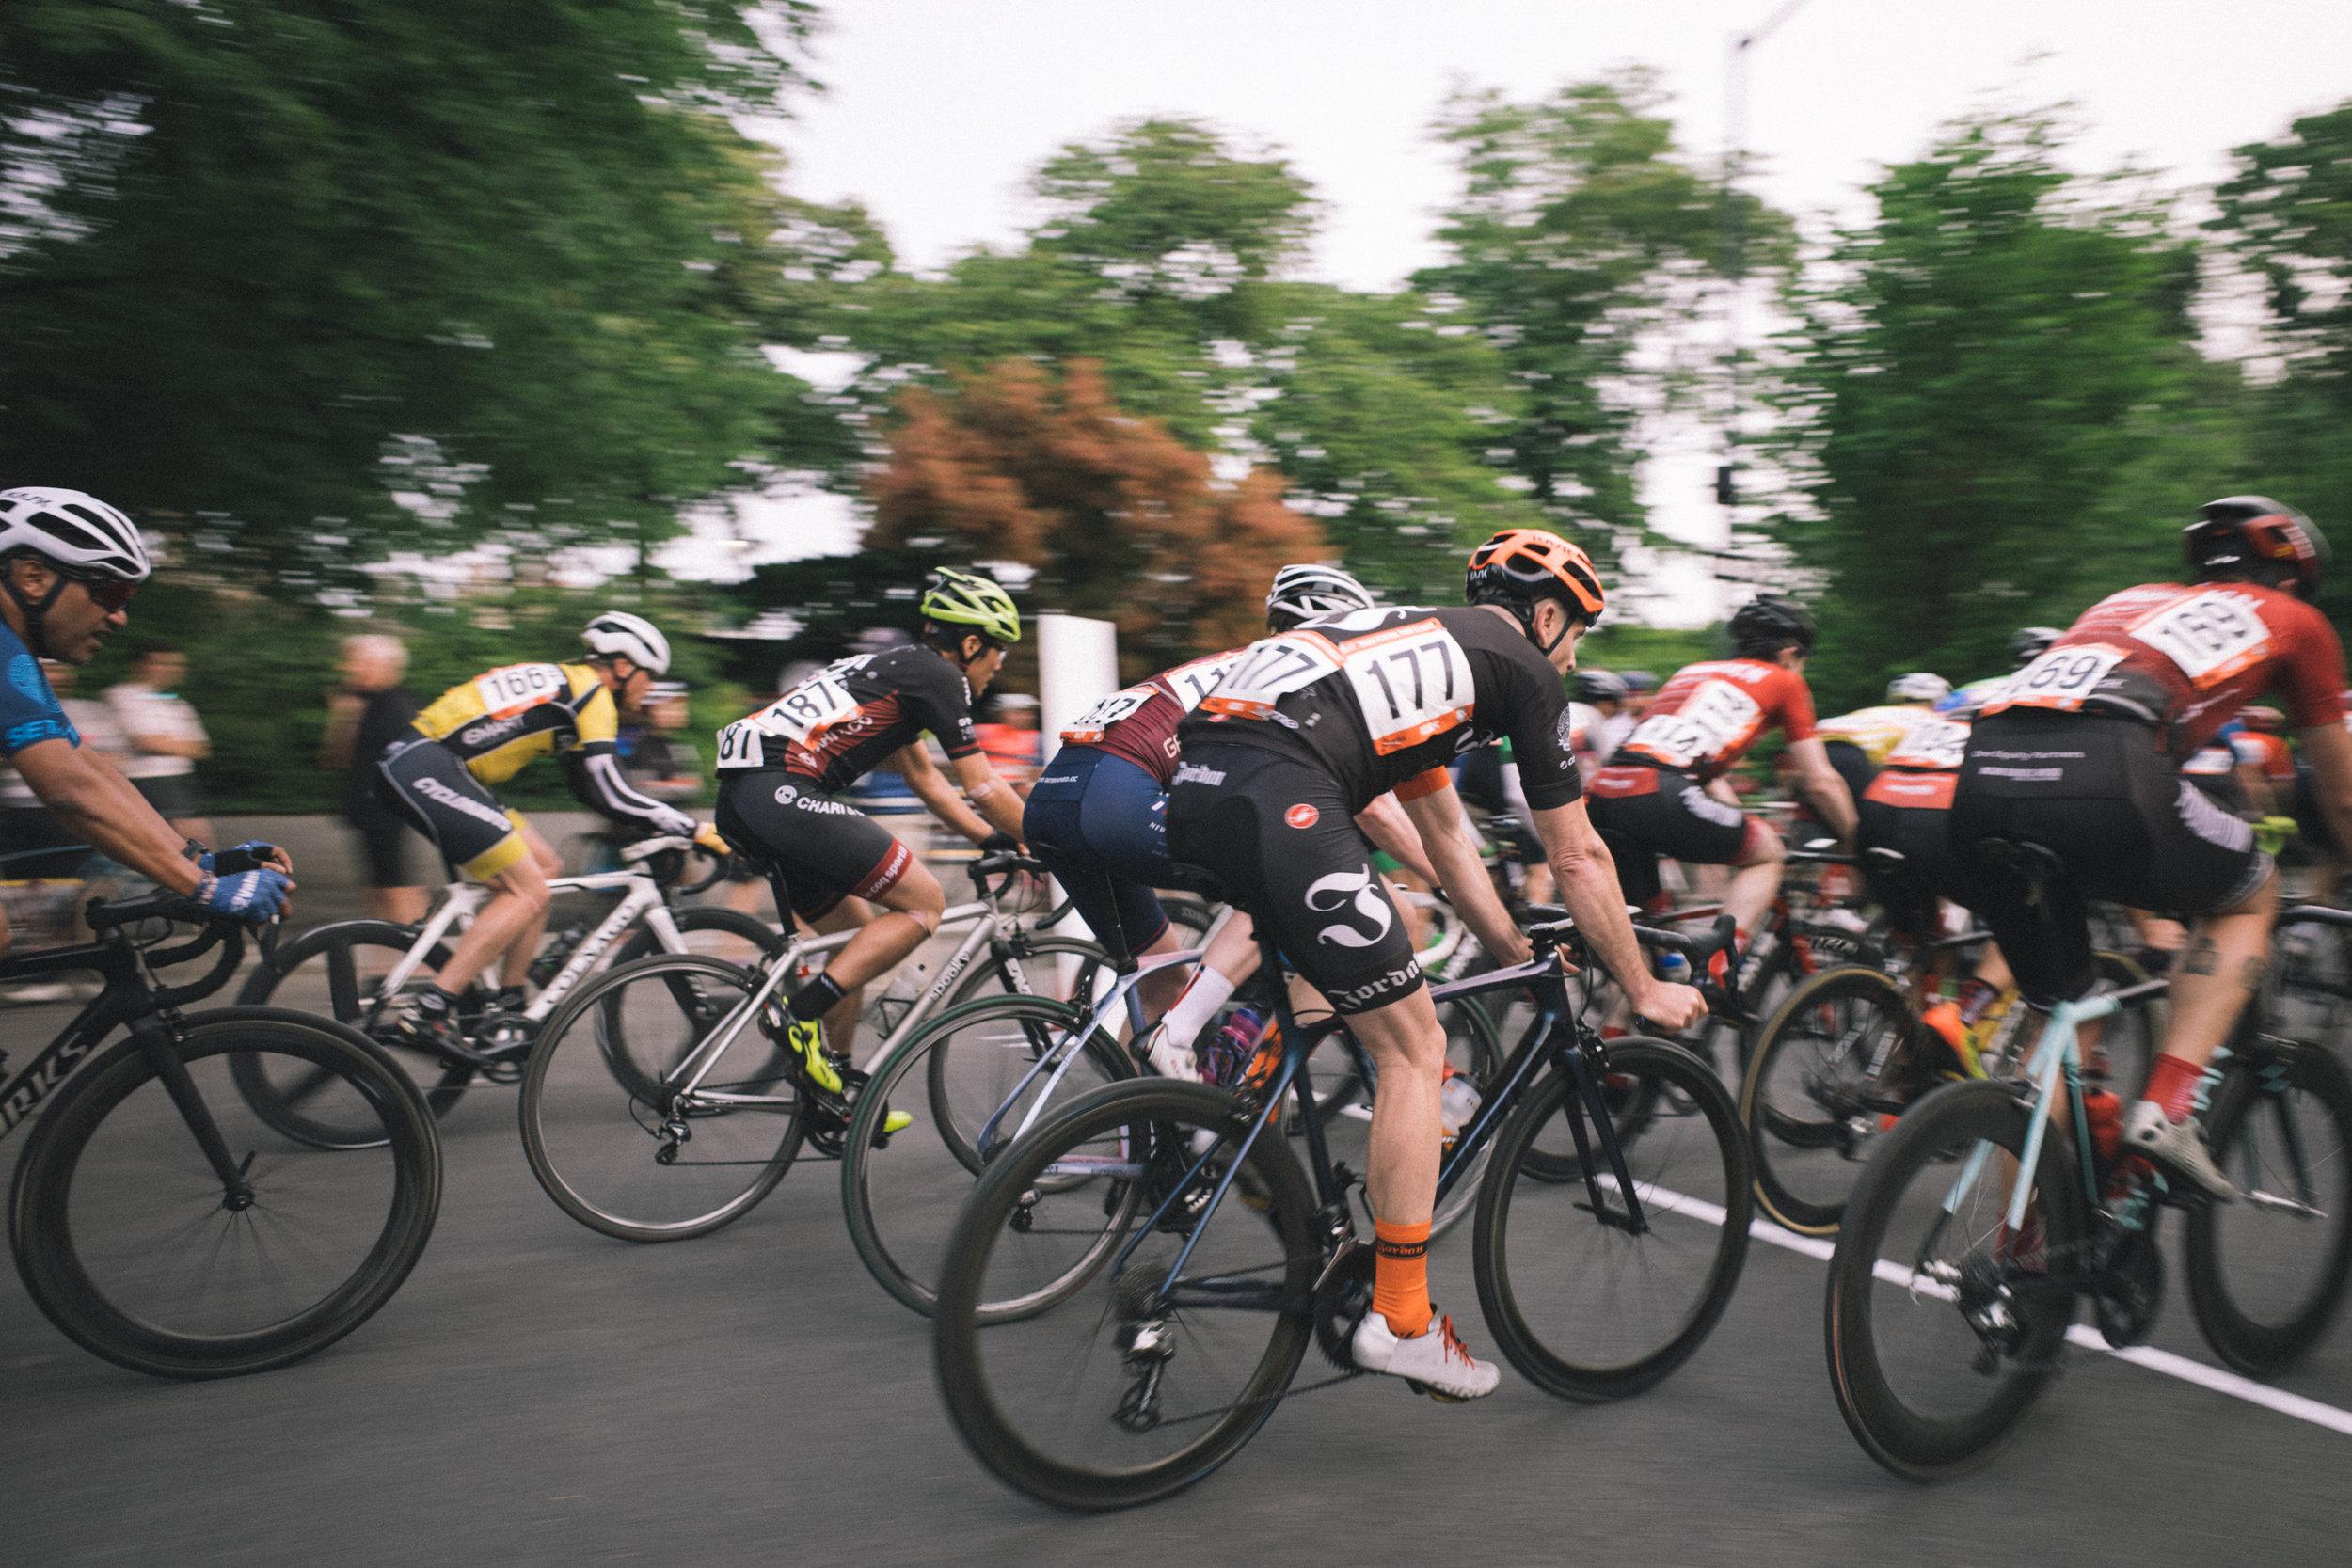 Photo Rhetoric - To Be Determined - Dave Jordan Central Park Classic-5050.jpg